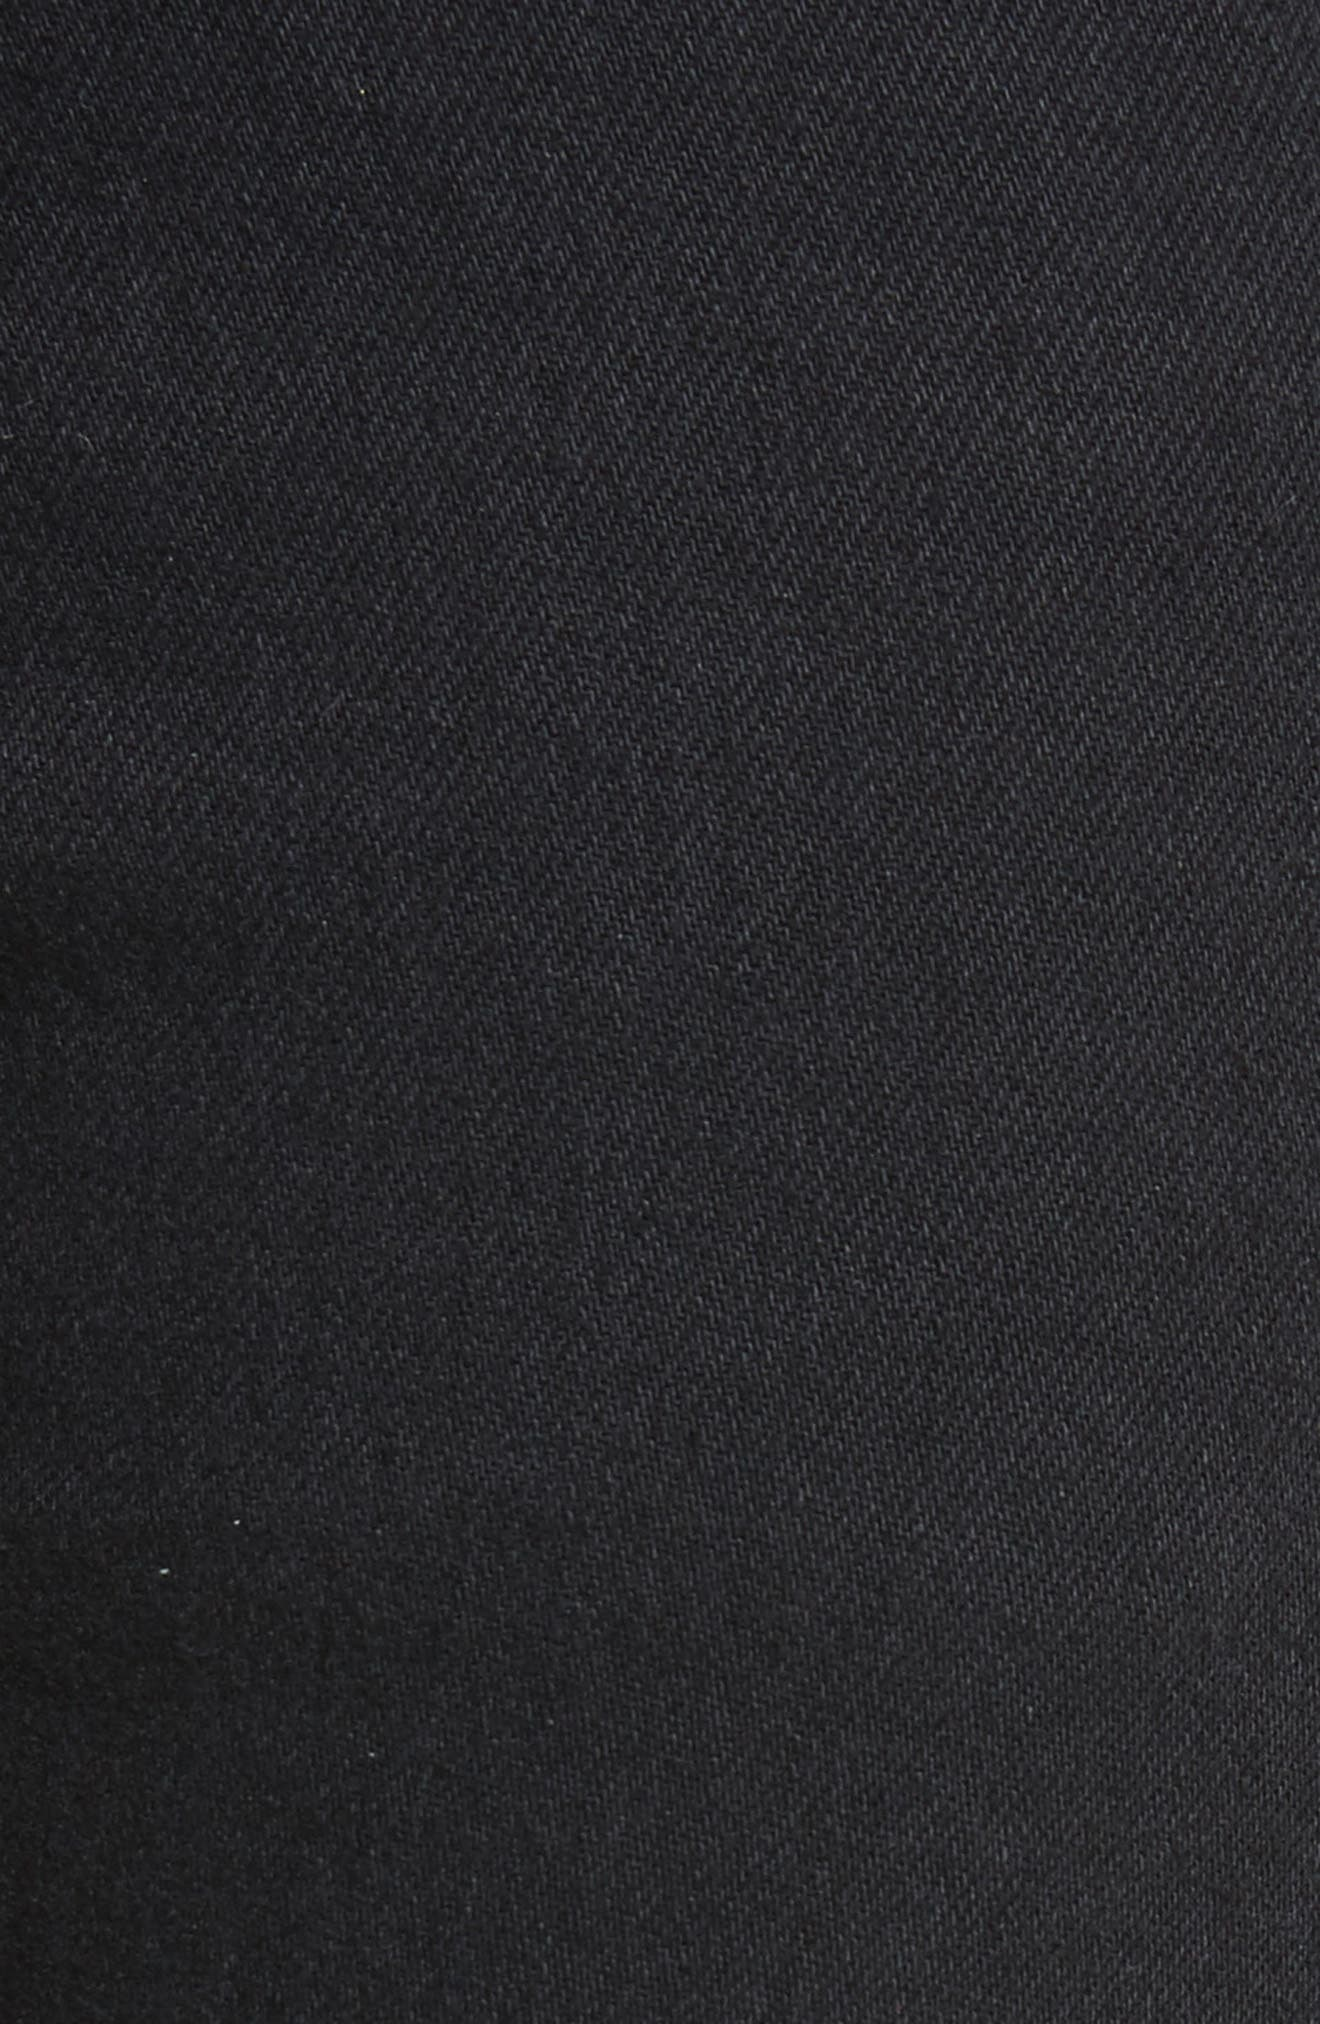 Boyd High Rise Jeans,                             Alternate thumbnail 5, color,                             Black